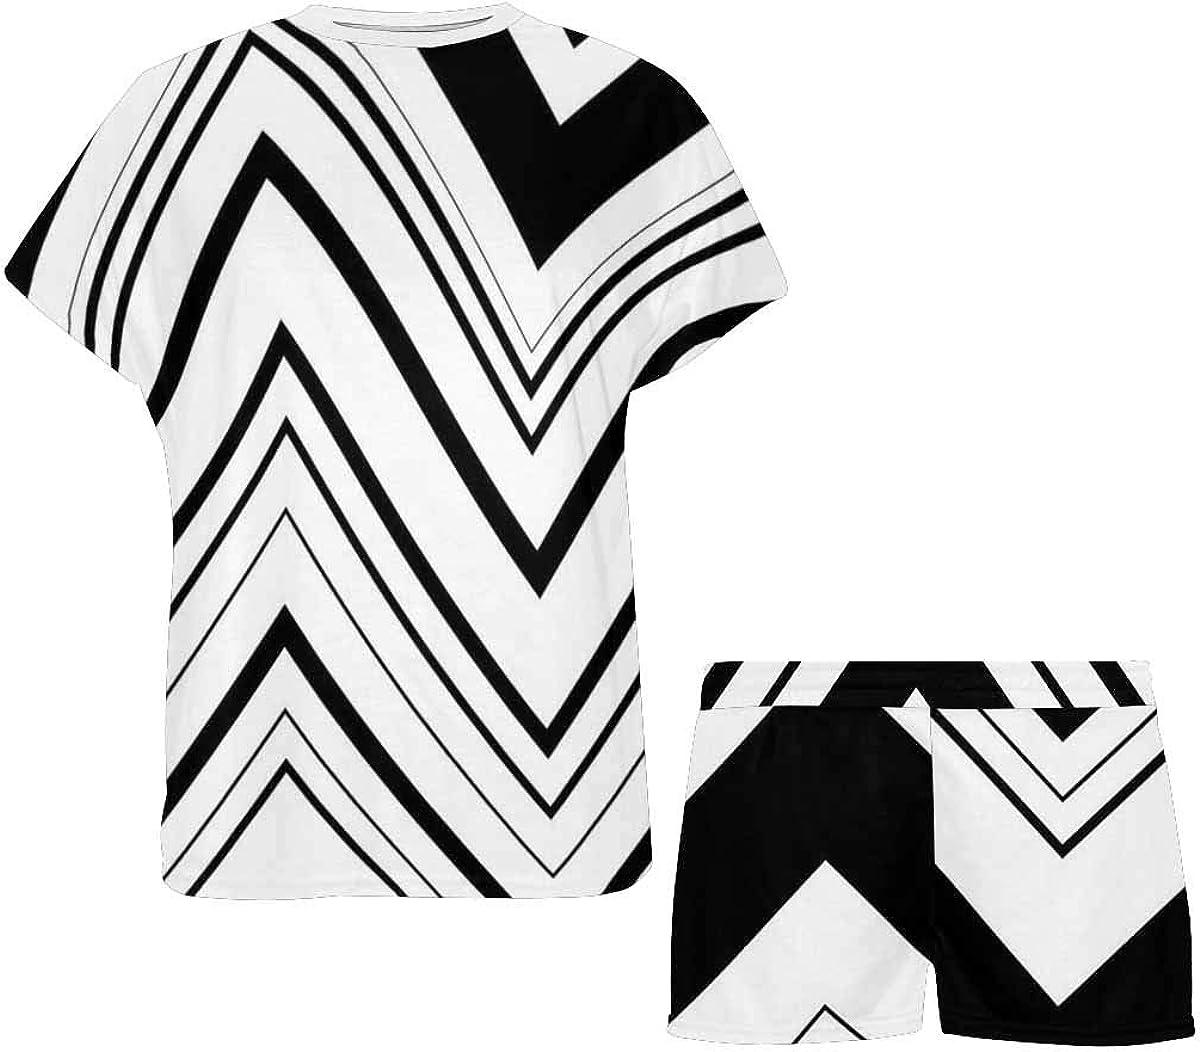 INTERESTPRINT Zigzag Pattern Women's Pajamas Short Sets Round Neck Short Sleeve Sleepwear